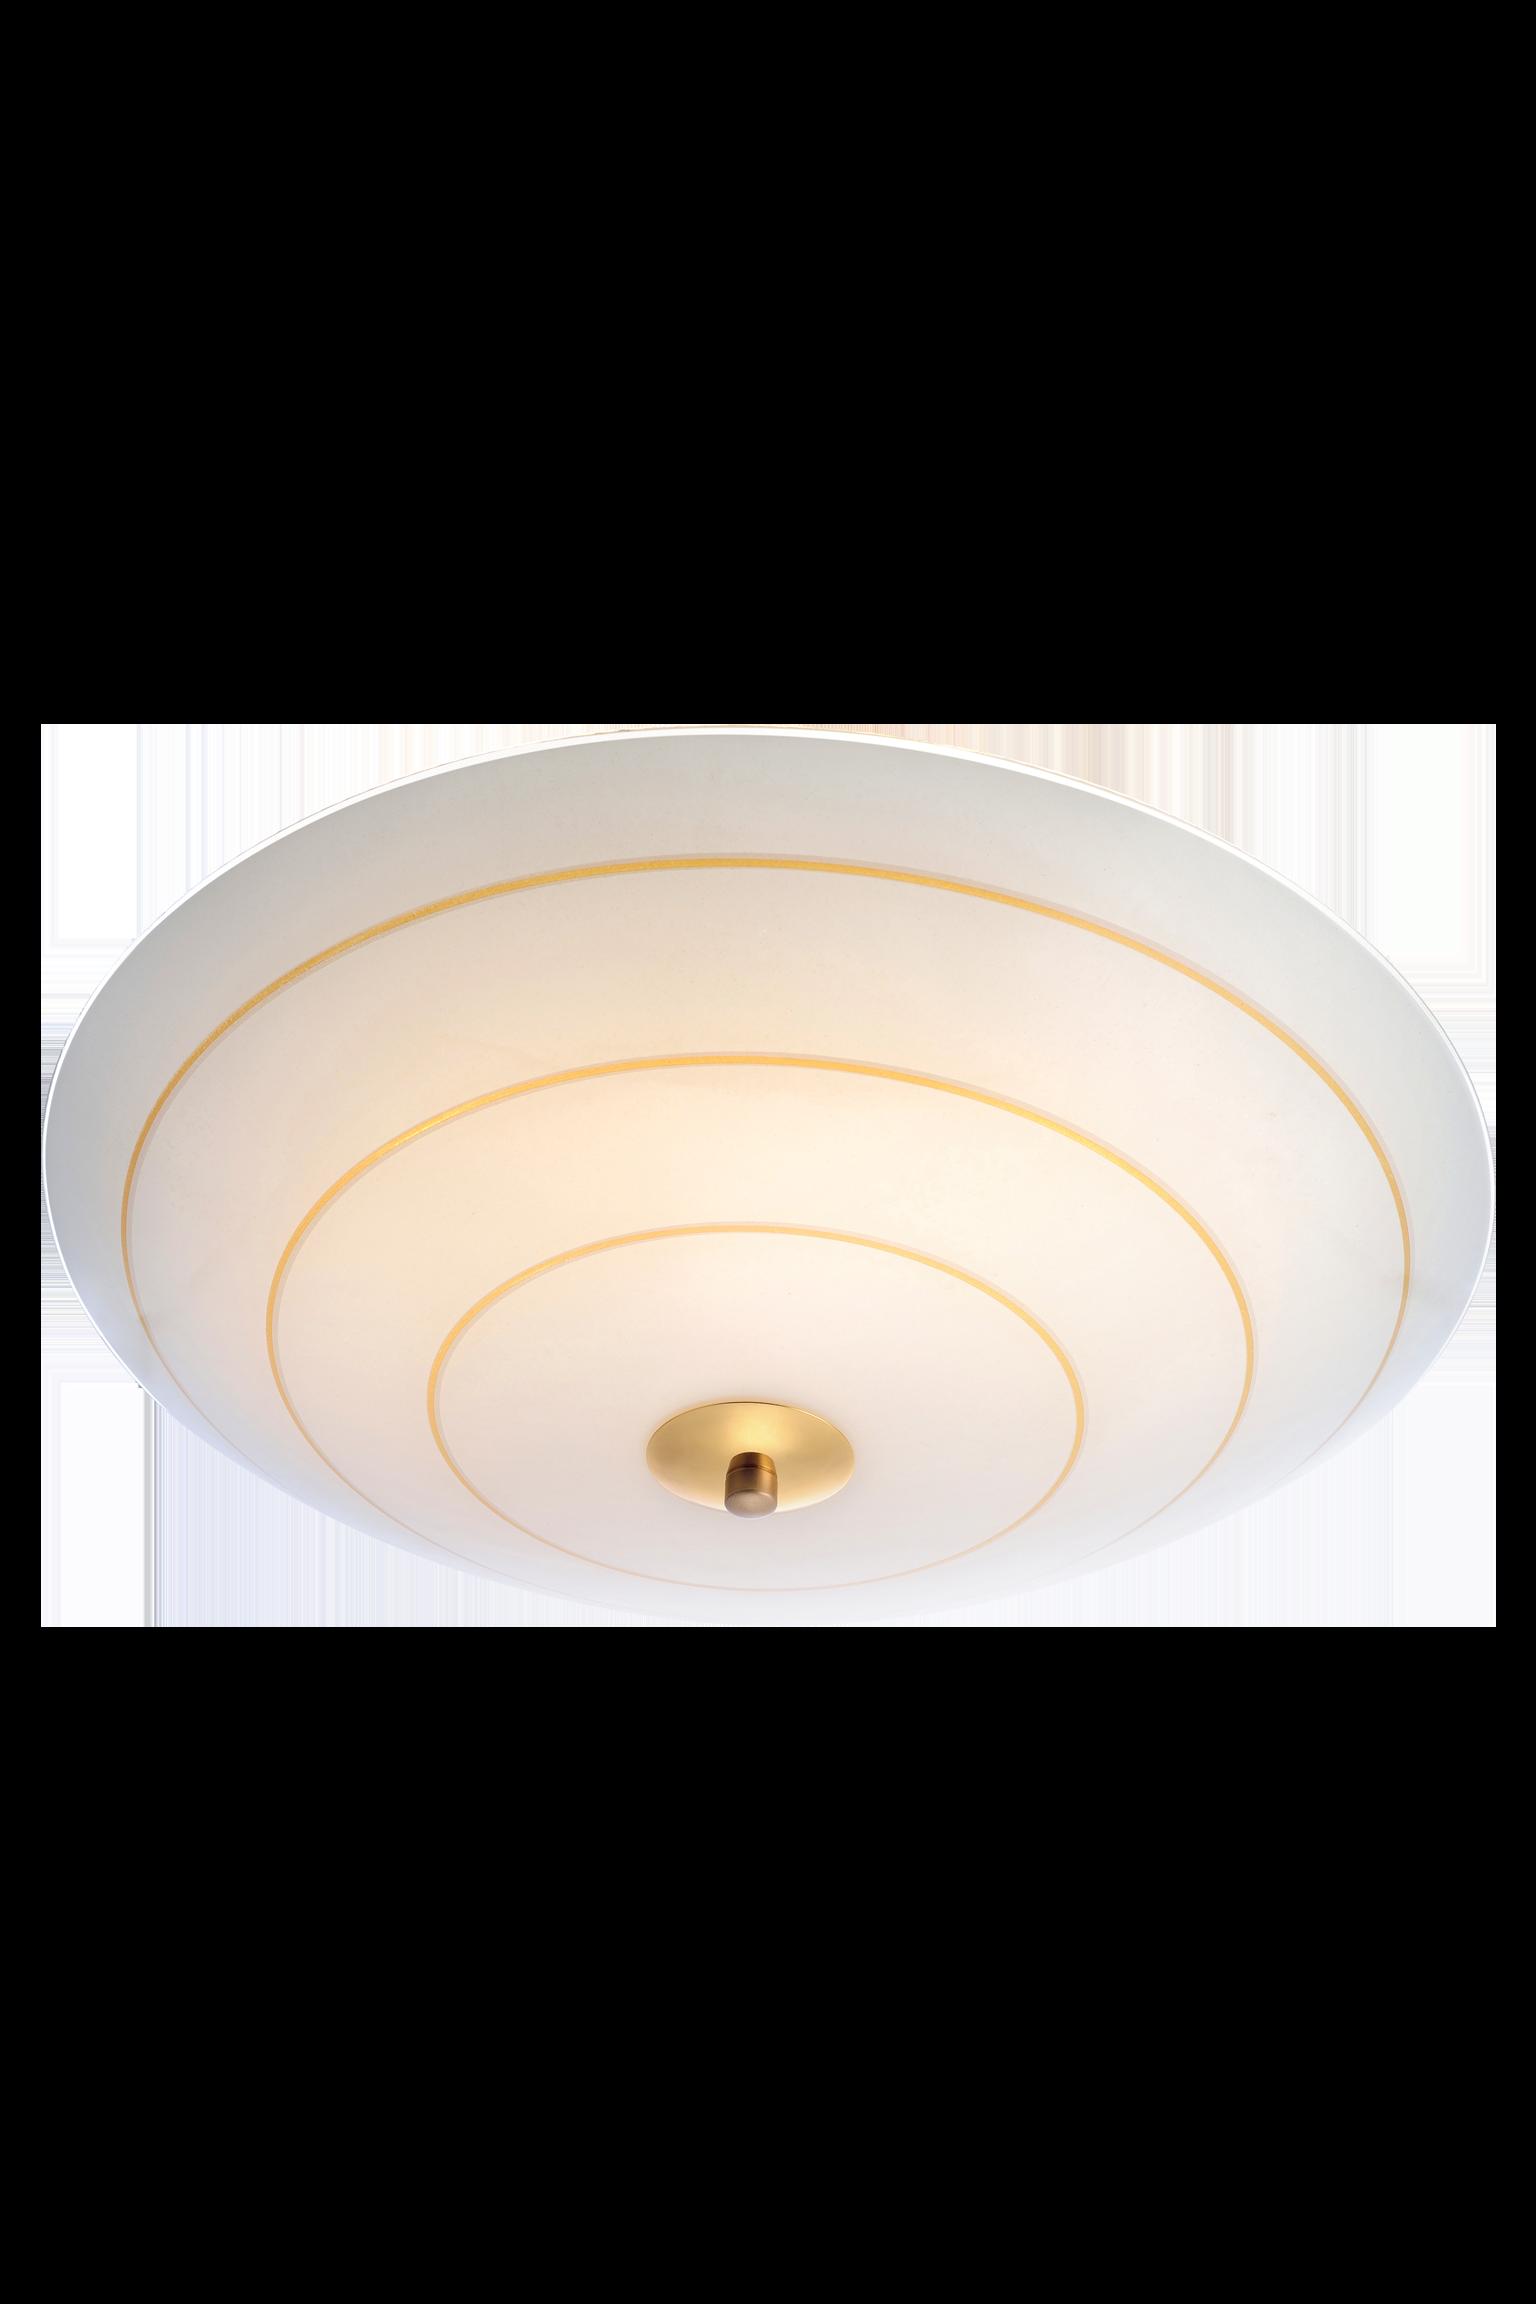 LYON - Plafond 43 LED